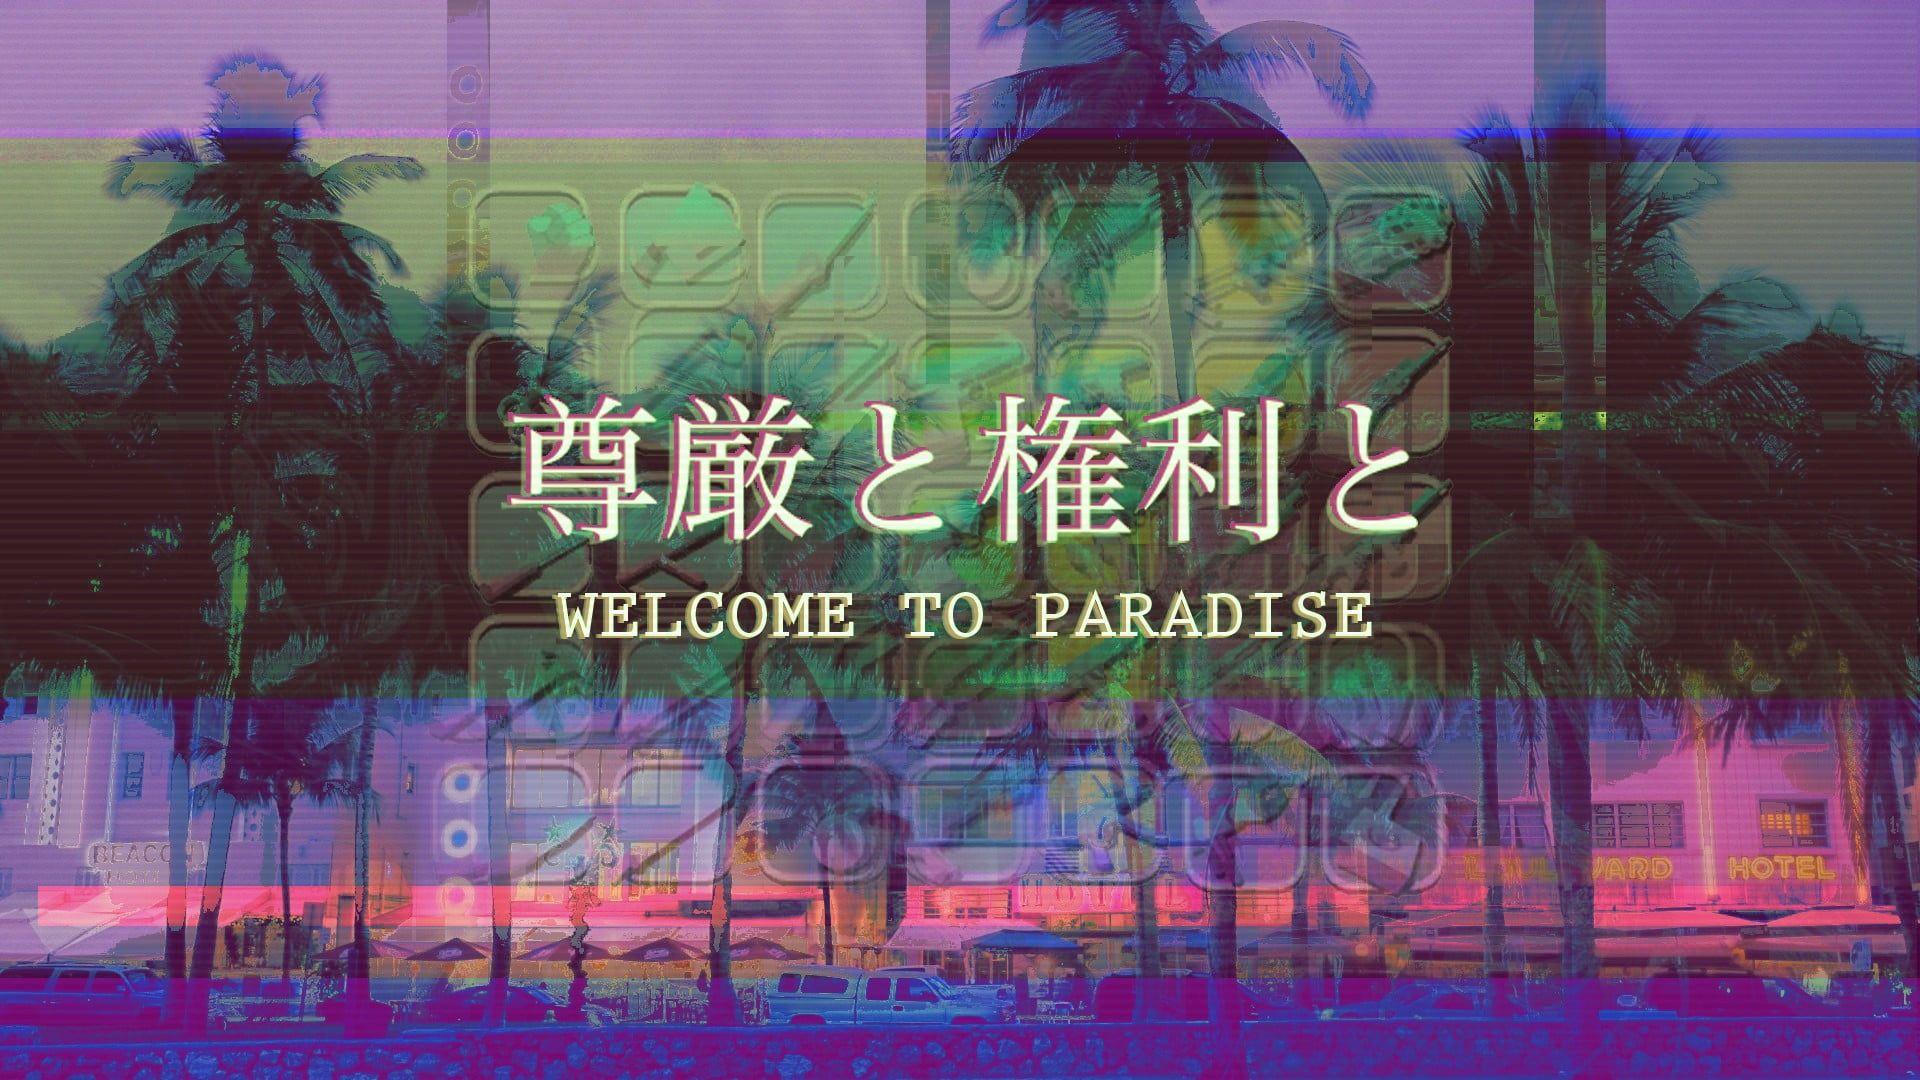 Welcome To Paradise Sign Vaporwave Vapor 1980s 80scity Artwork Pixel Art Glitch Art Vhs Video Tape 1080p In 2020 Vaporwave Wallpaper Anime Wallpaper Vaporwave